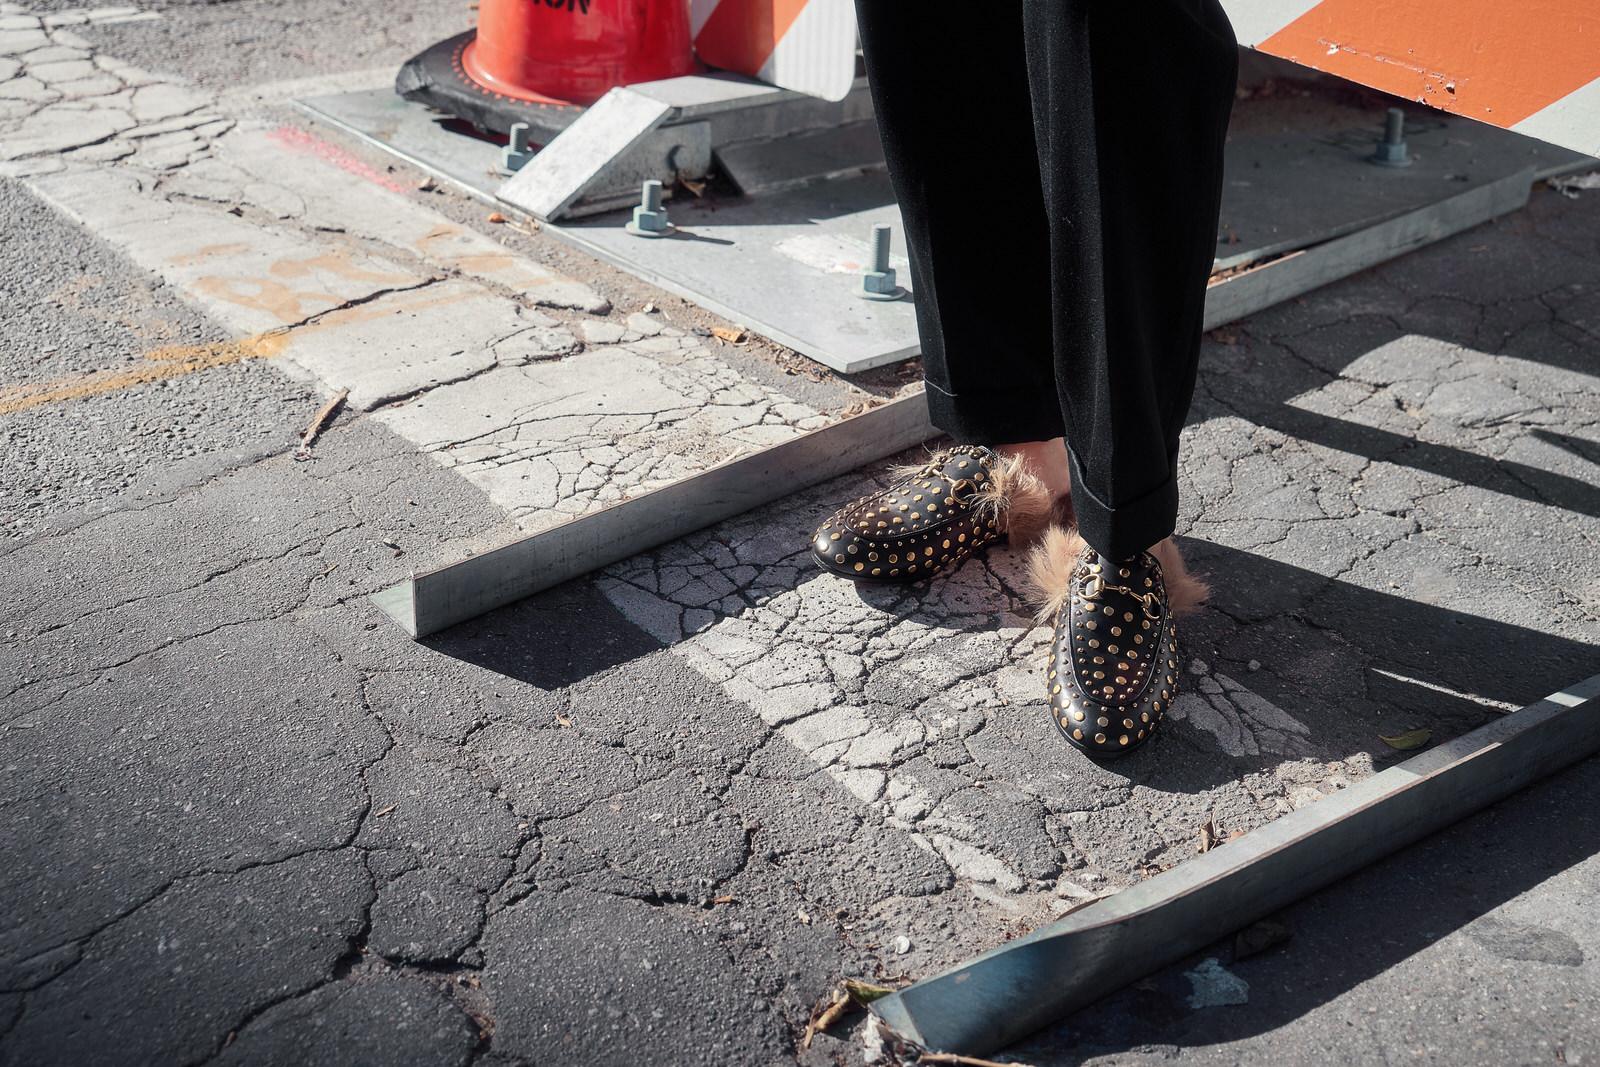 vintage kenzo blazer | alexander mcqueen trousers |  gucci slippers  |  photos by sean martin